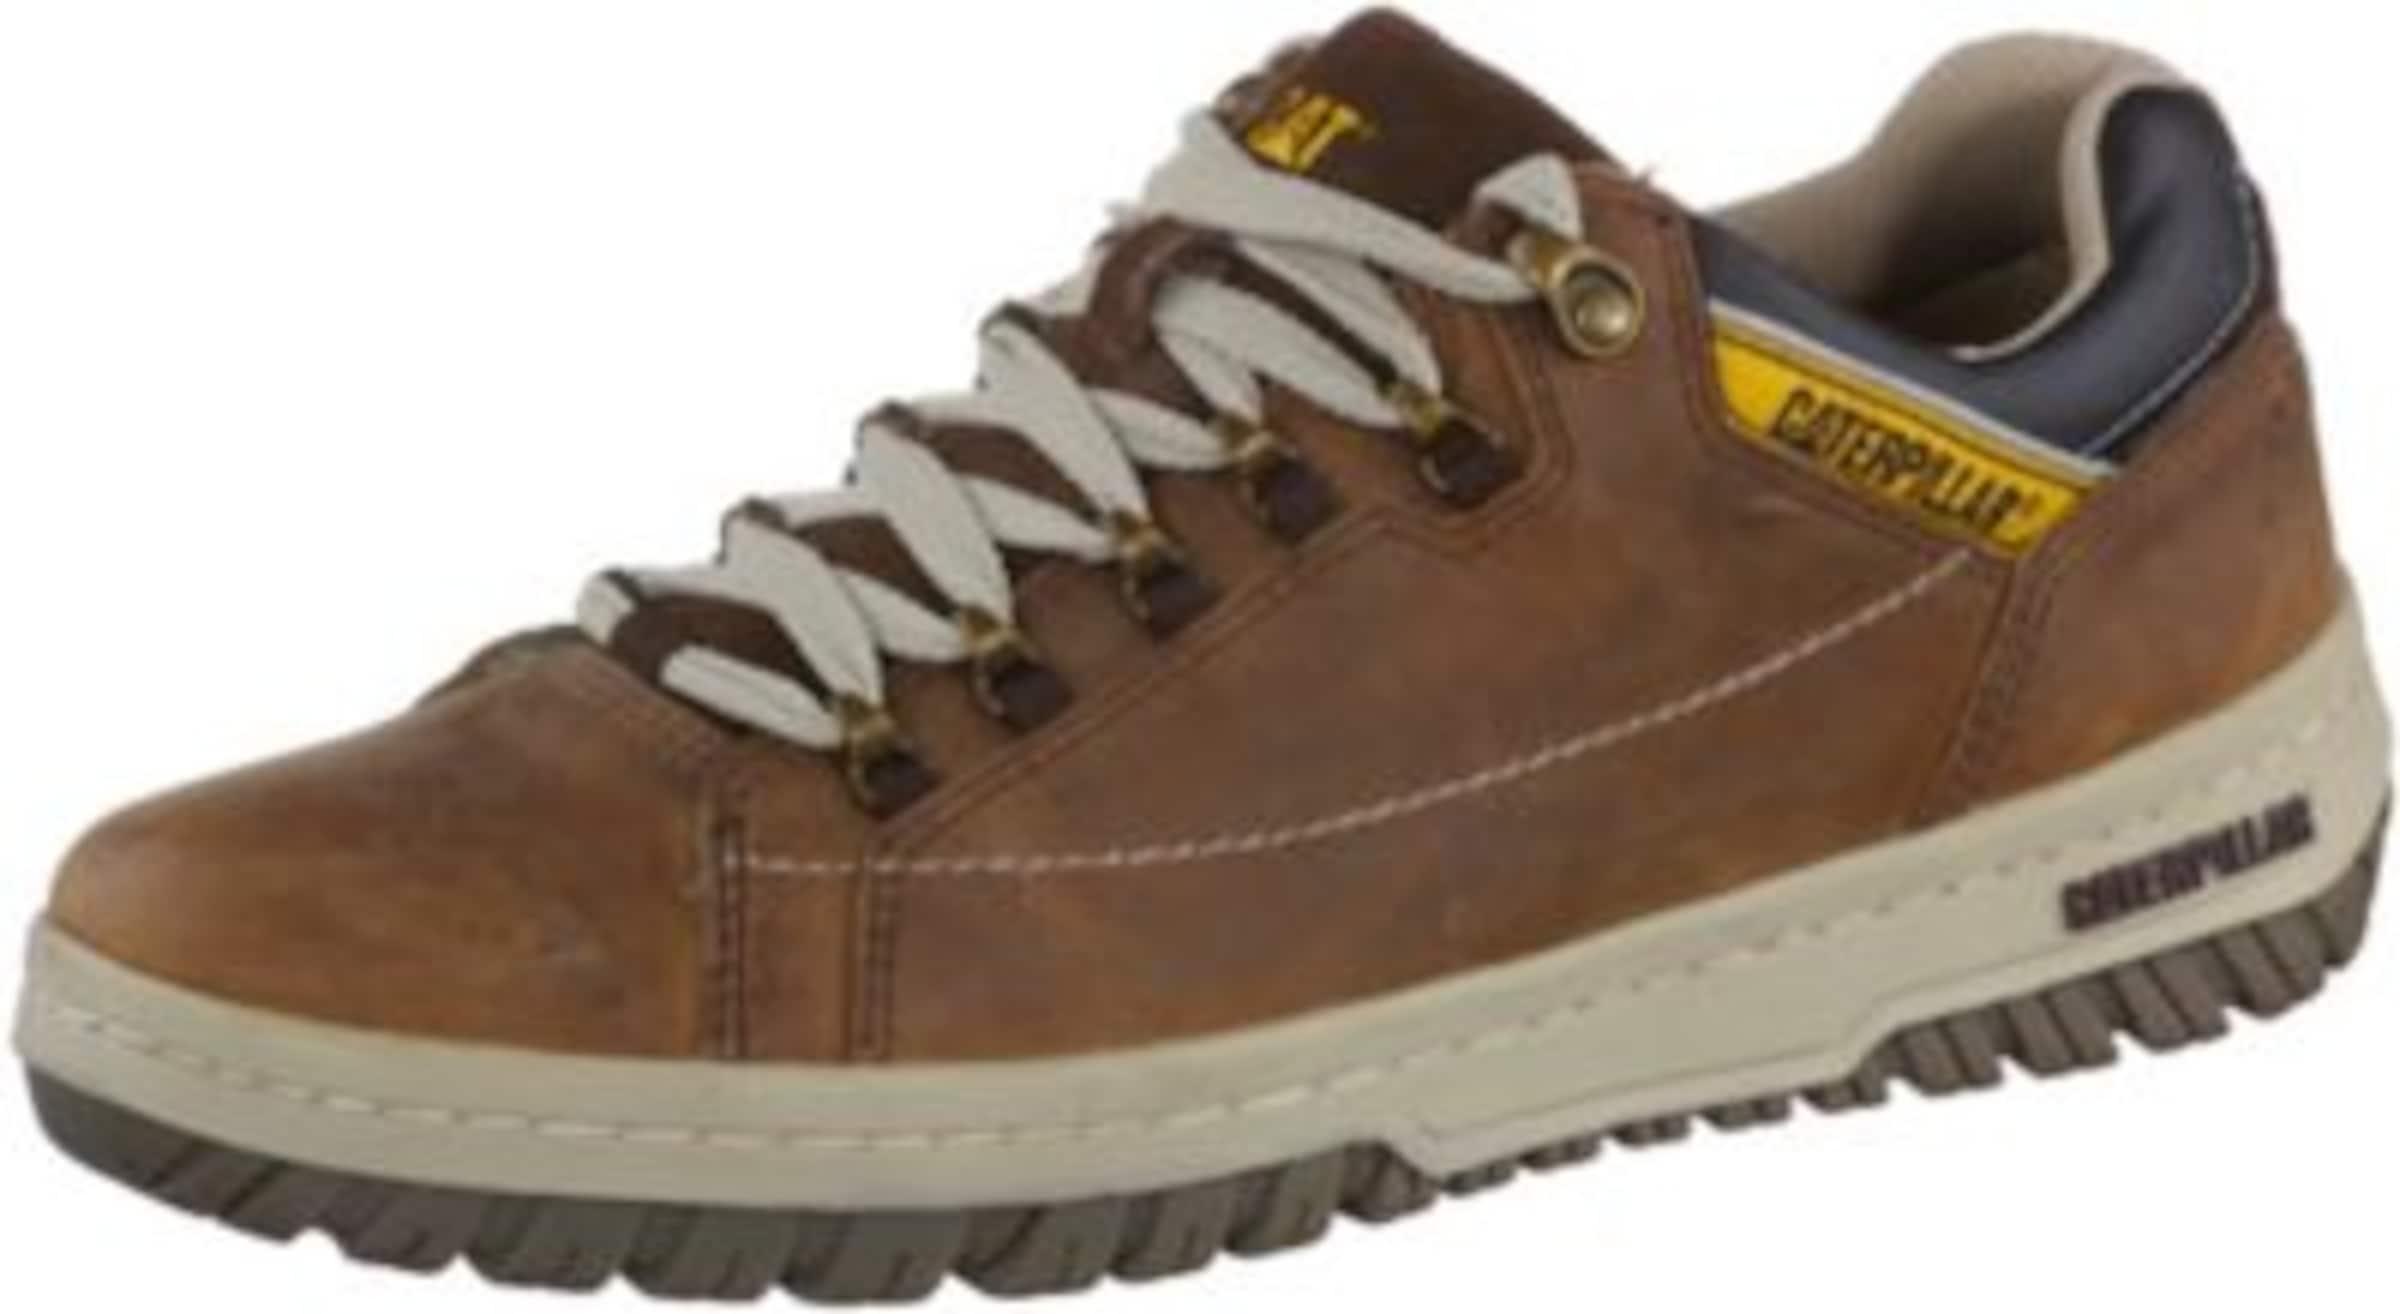 CATERPILLAR Sneaker Apa Günstige und langlebige Schuhe